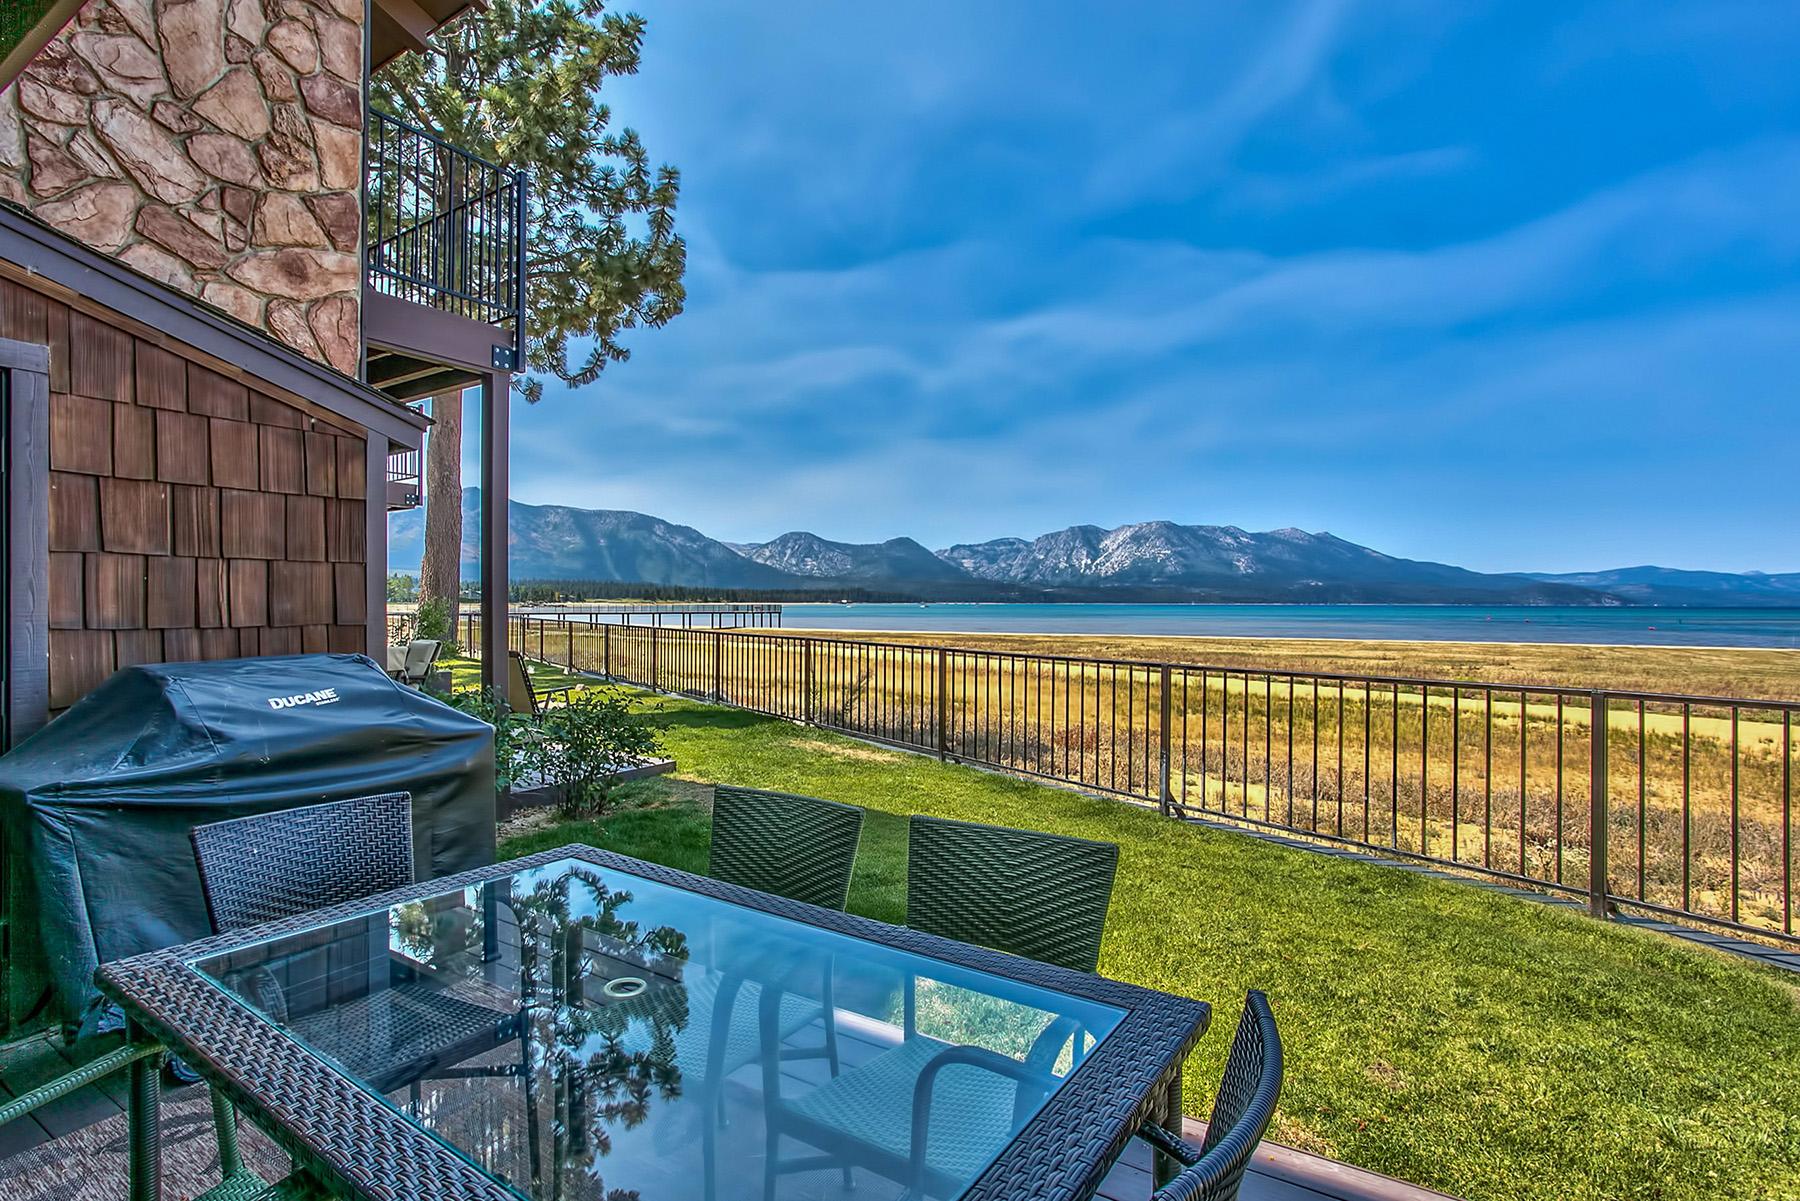 Townhouse for Active at 336 Ala Wai #269 336 Ala Wai Boulevard #269 South Lake Tahoe, California 96150 United States